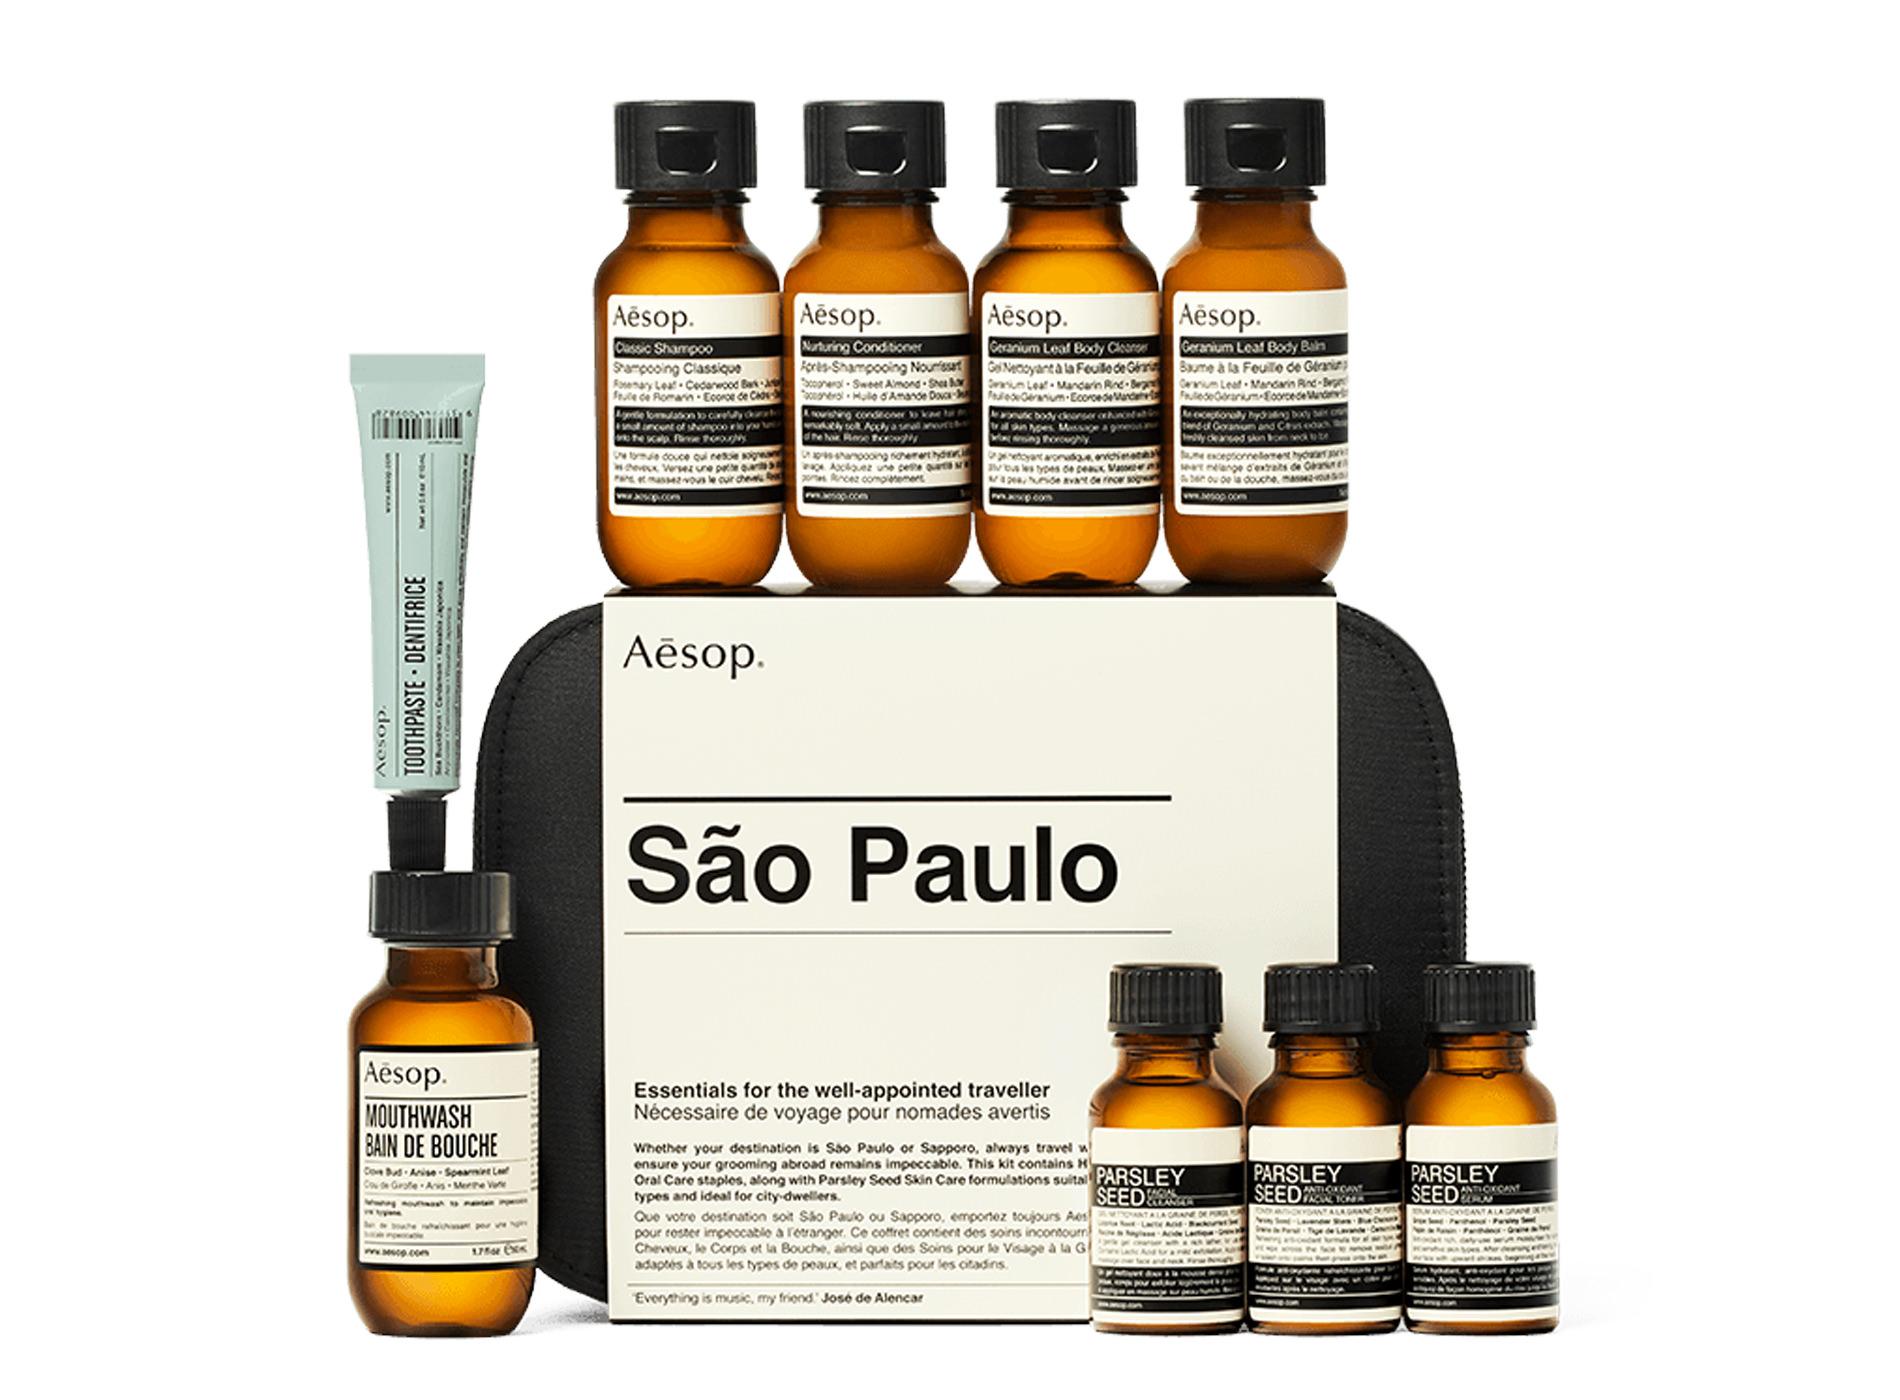 Aesop Coffret Voyage São Paulo